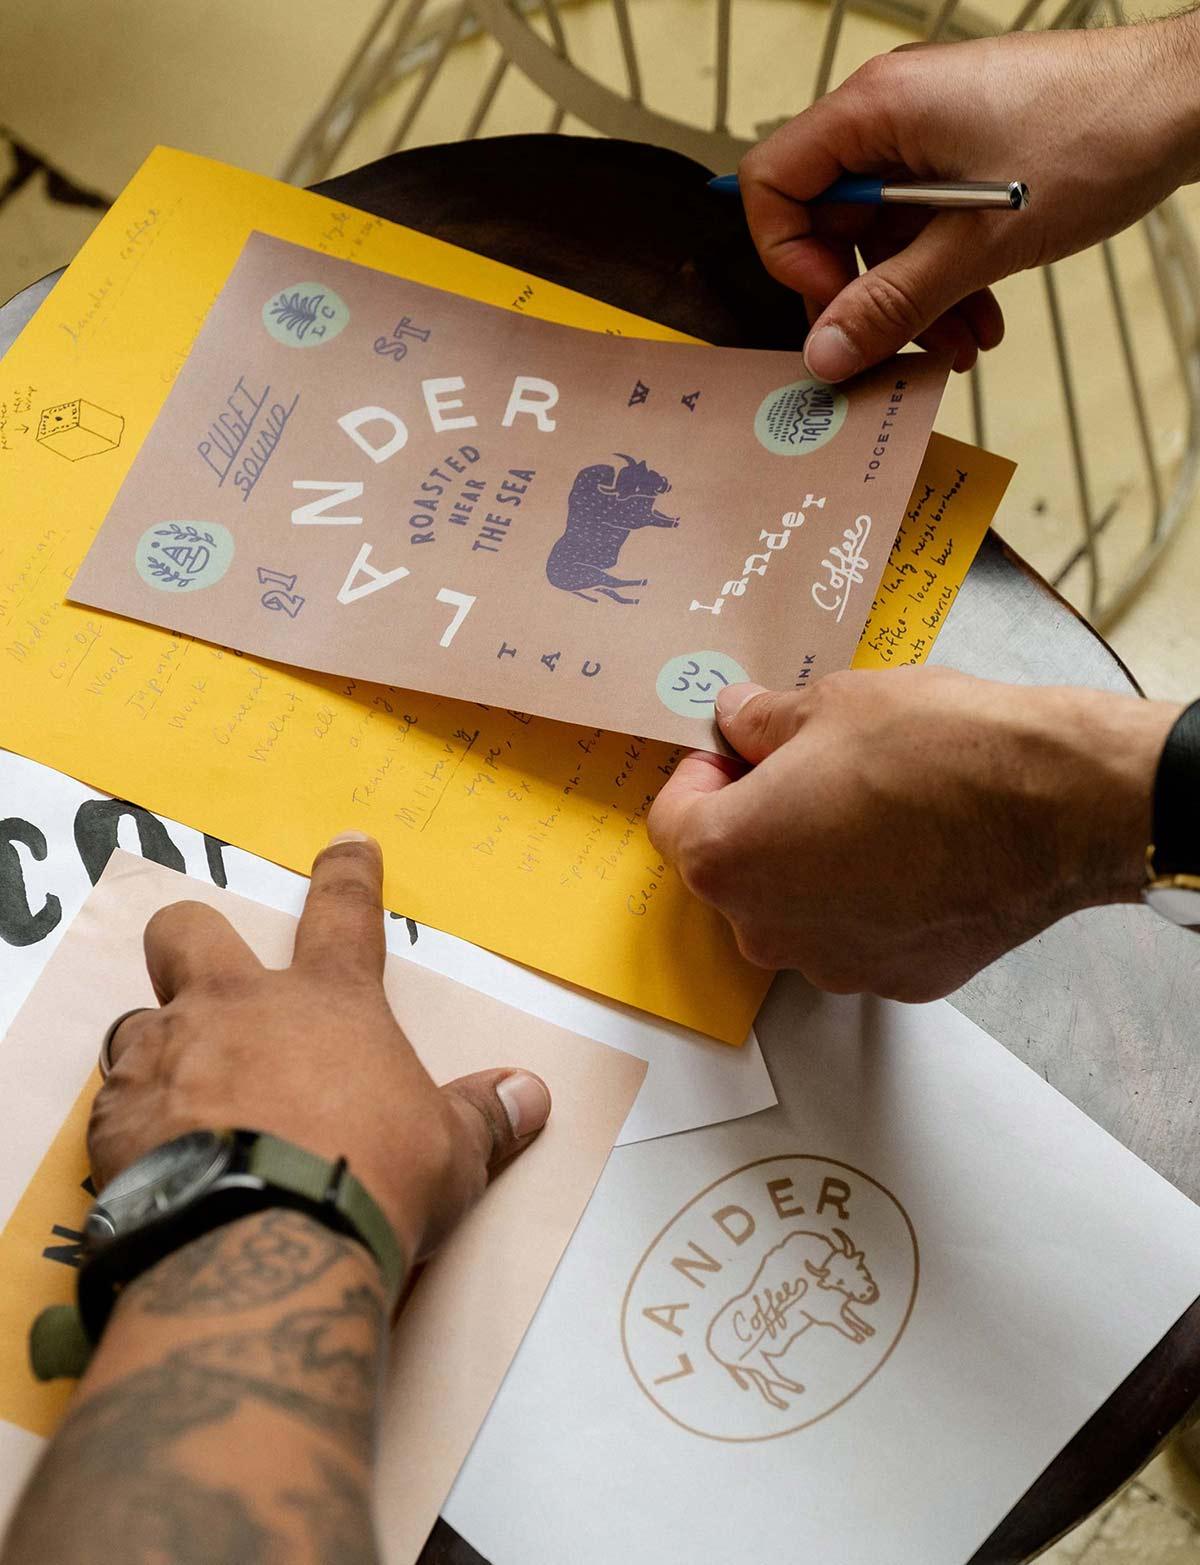 siotes-branding-seattle-tacoma-design-studio-branding-31-lander-coffee